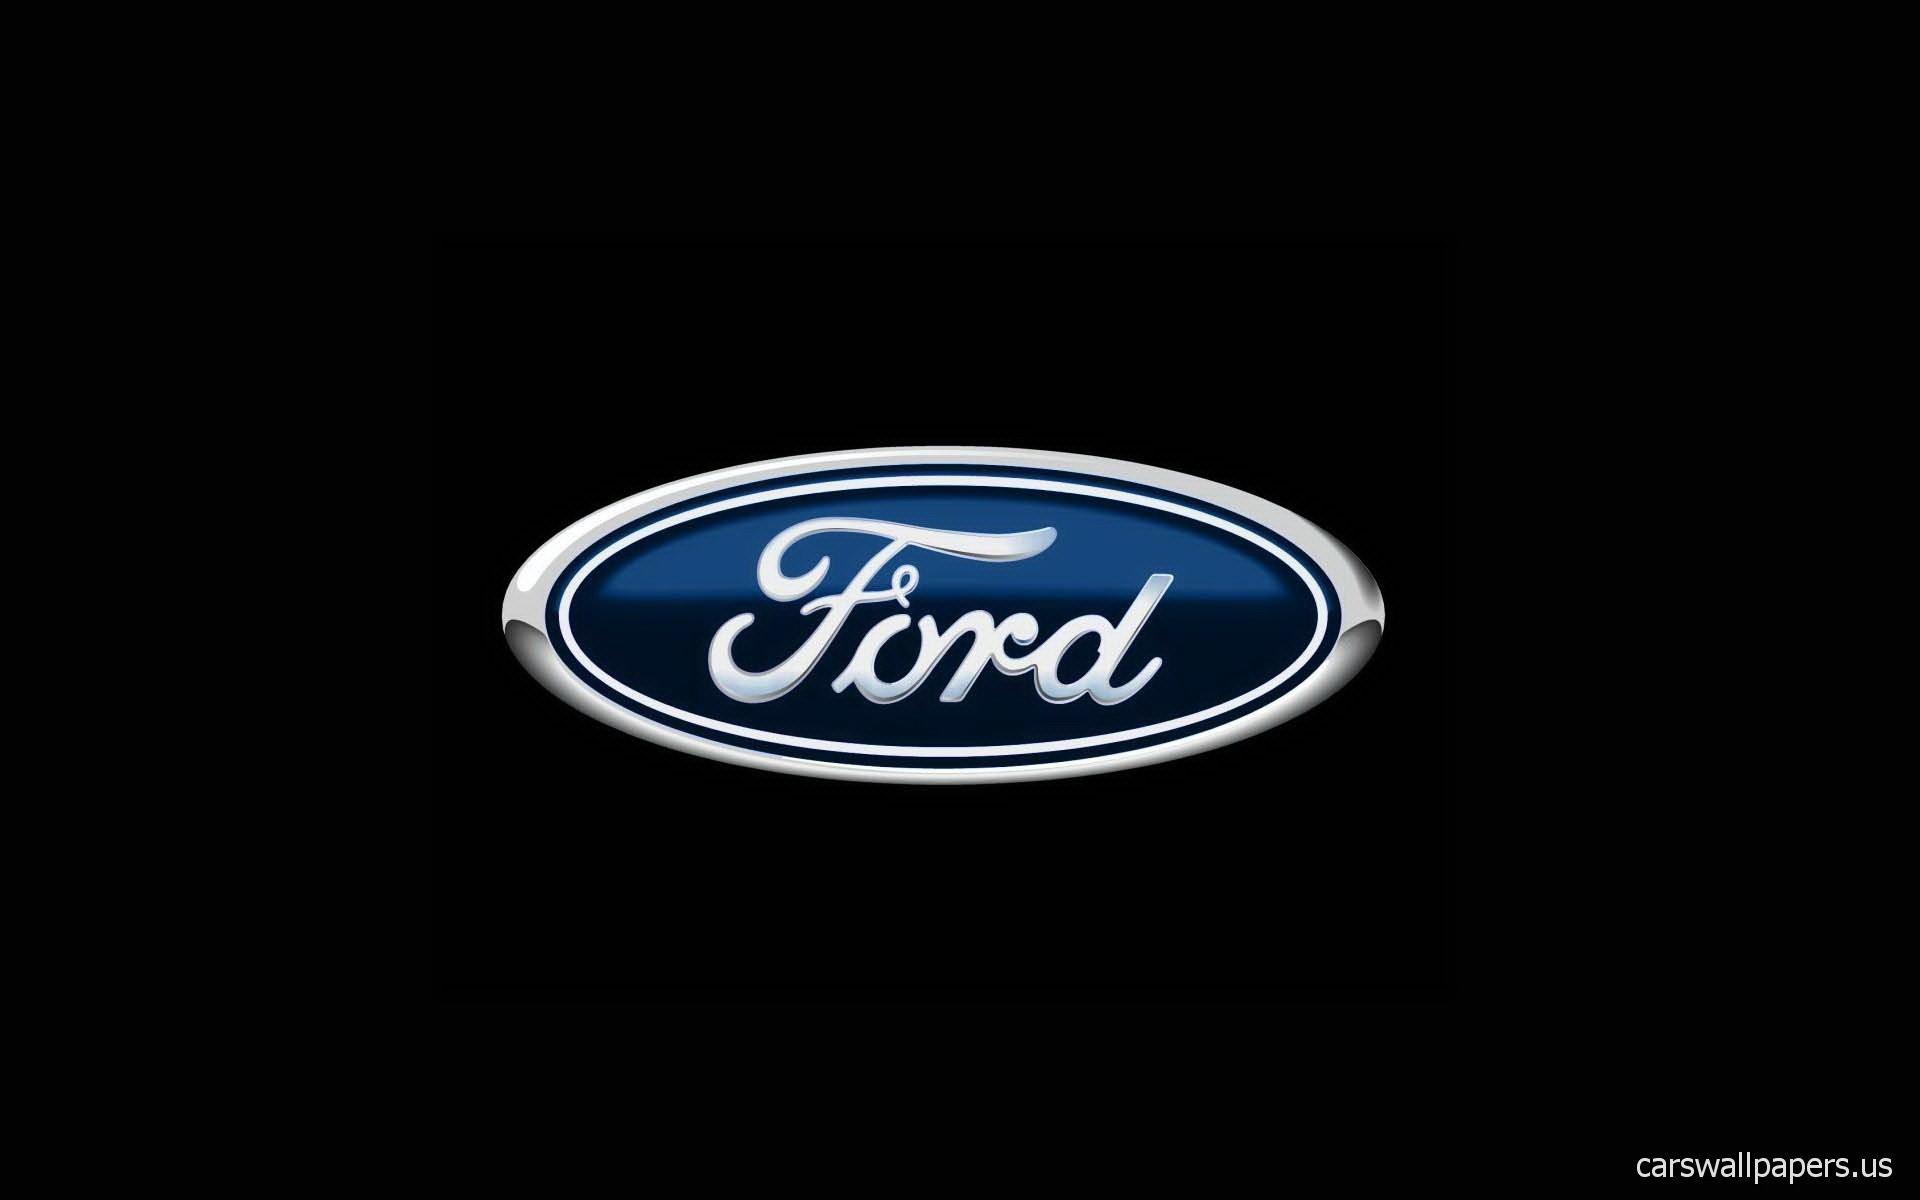 ford mustang logo wallpaper wallpaper name ford mustang logo wallpaper .